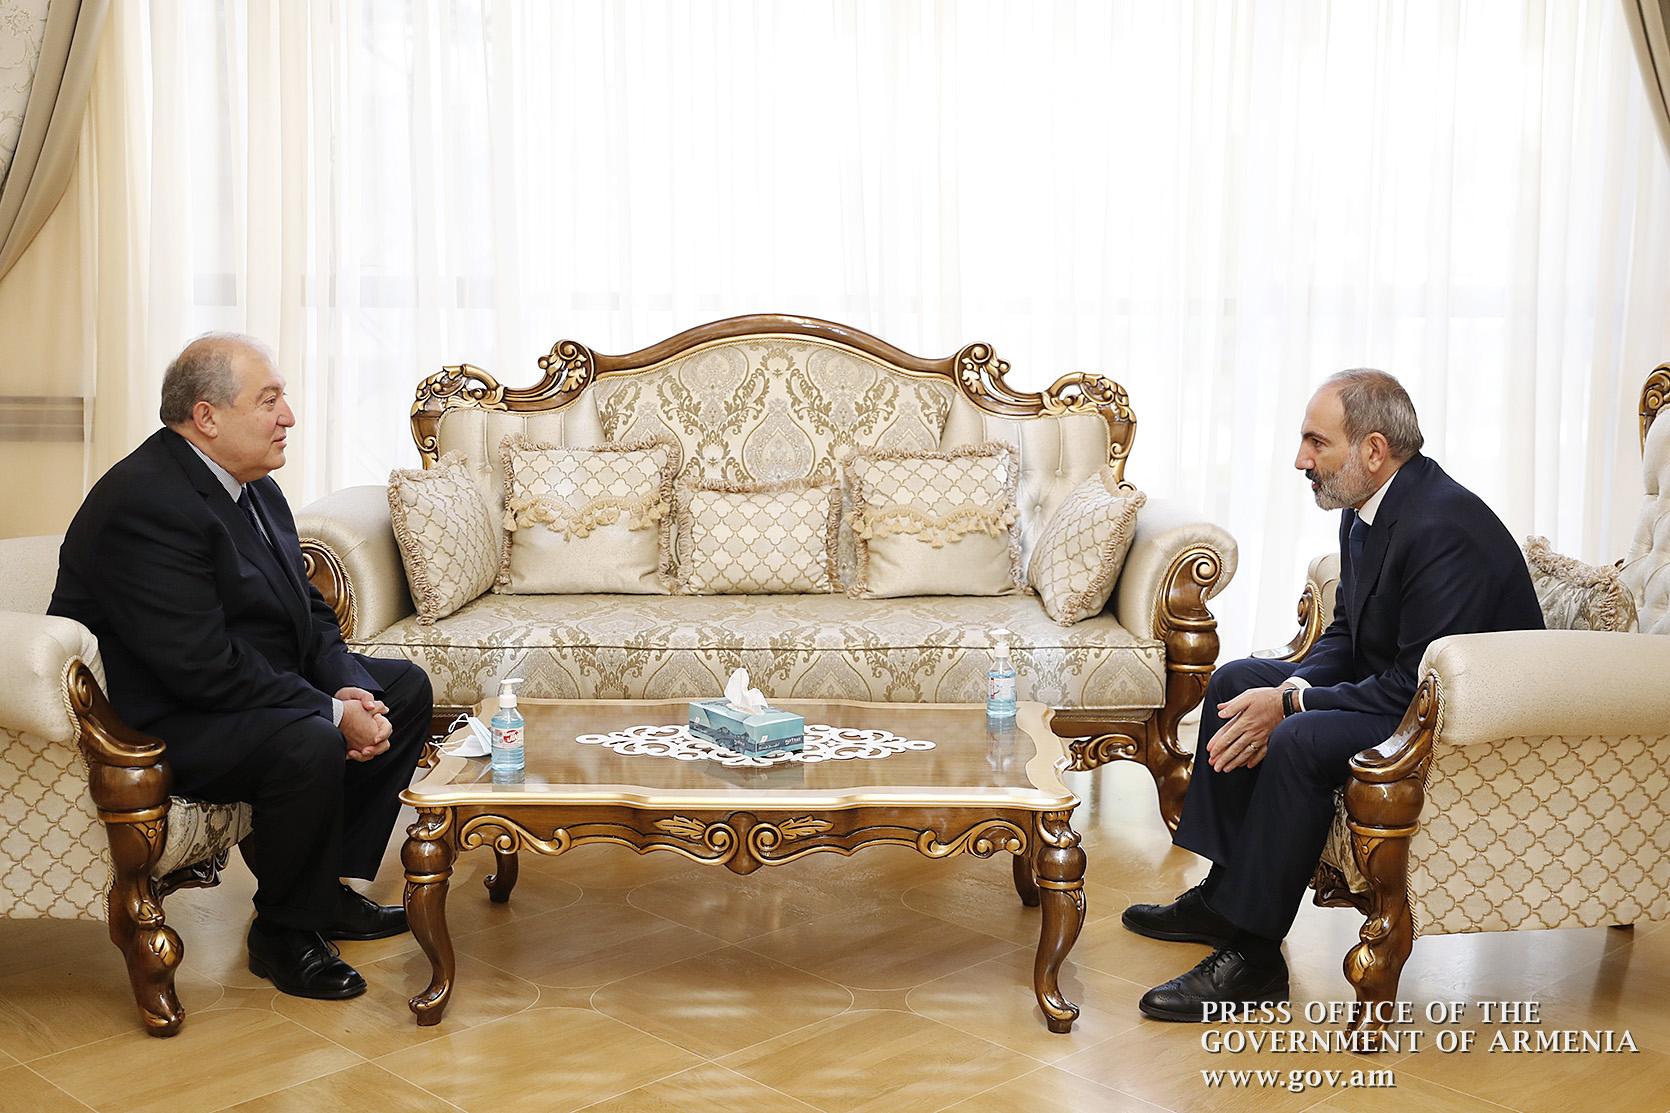 Photo of Состоялась встреча премьер-министра Никола Пашиняна и президента Армена Саркисяна